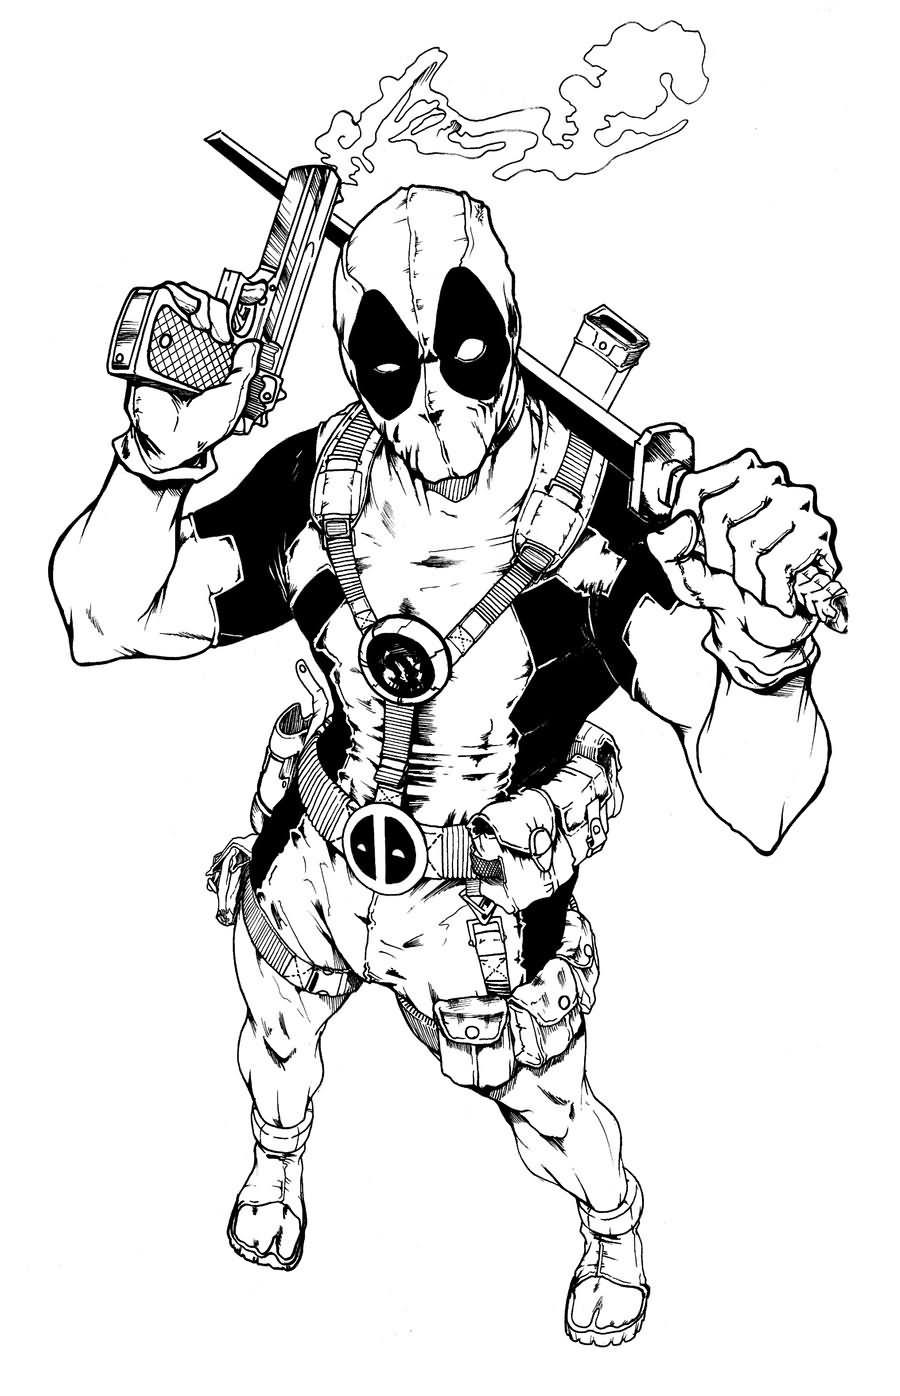 black deadpool with gun and sword tattoo stencil by adam bryce thomas